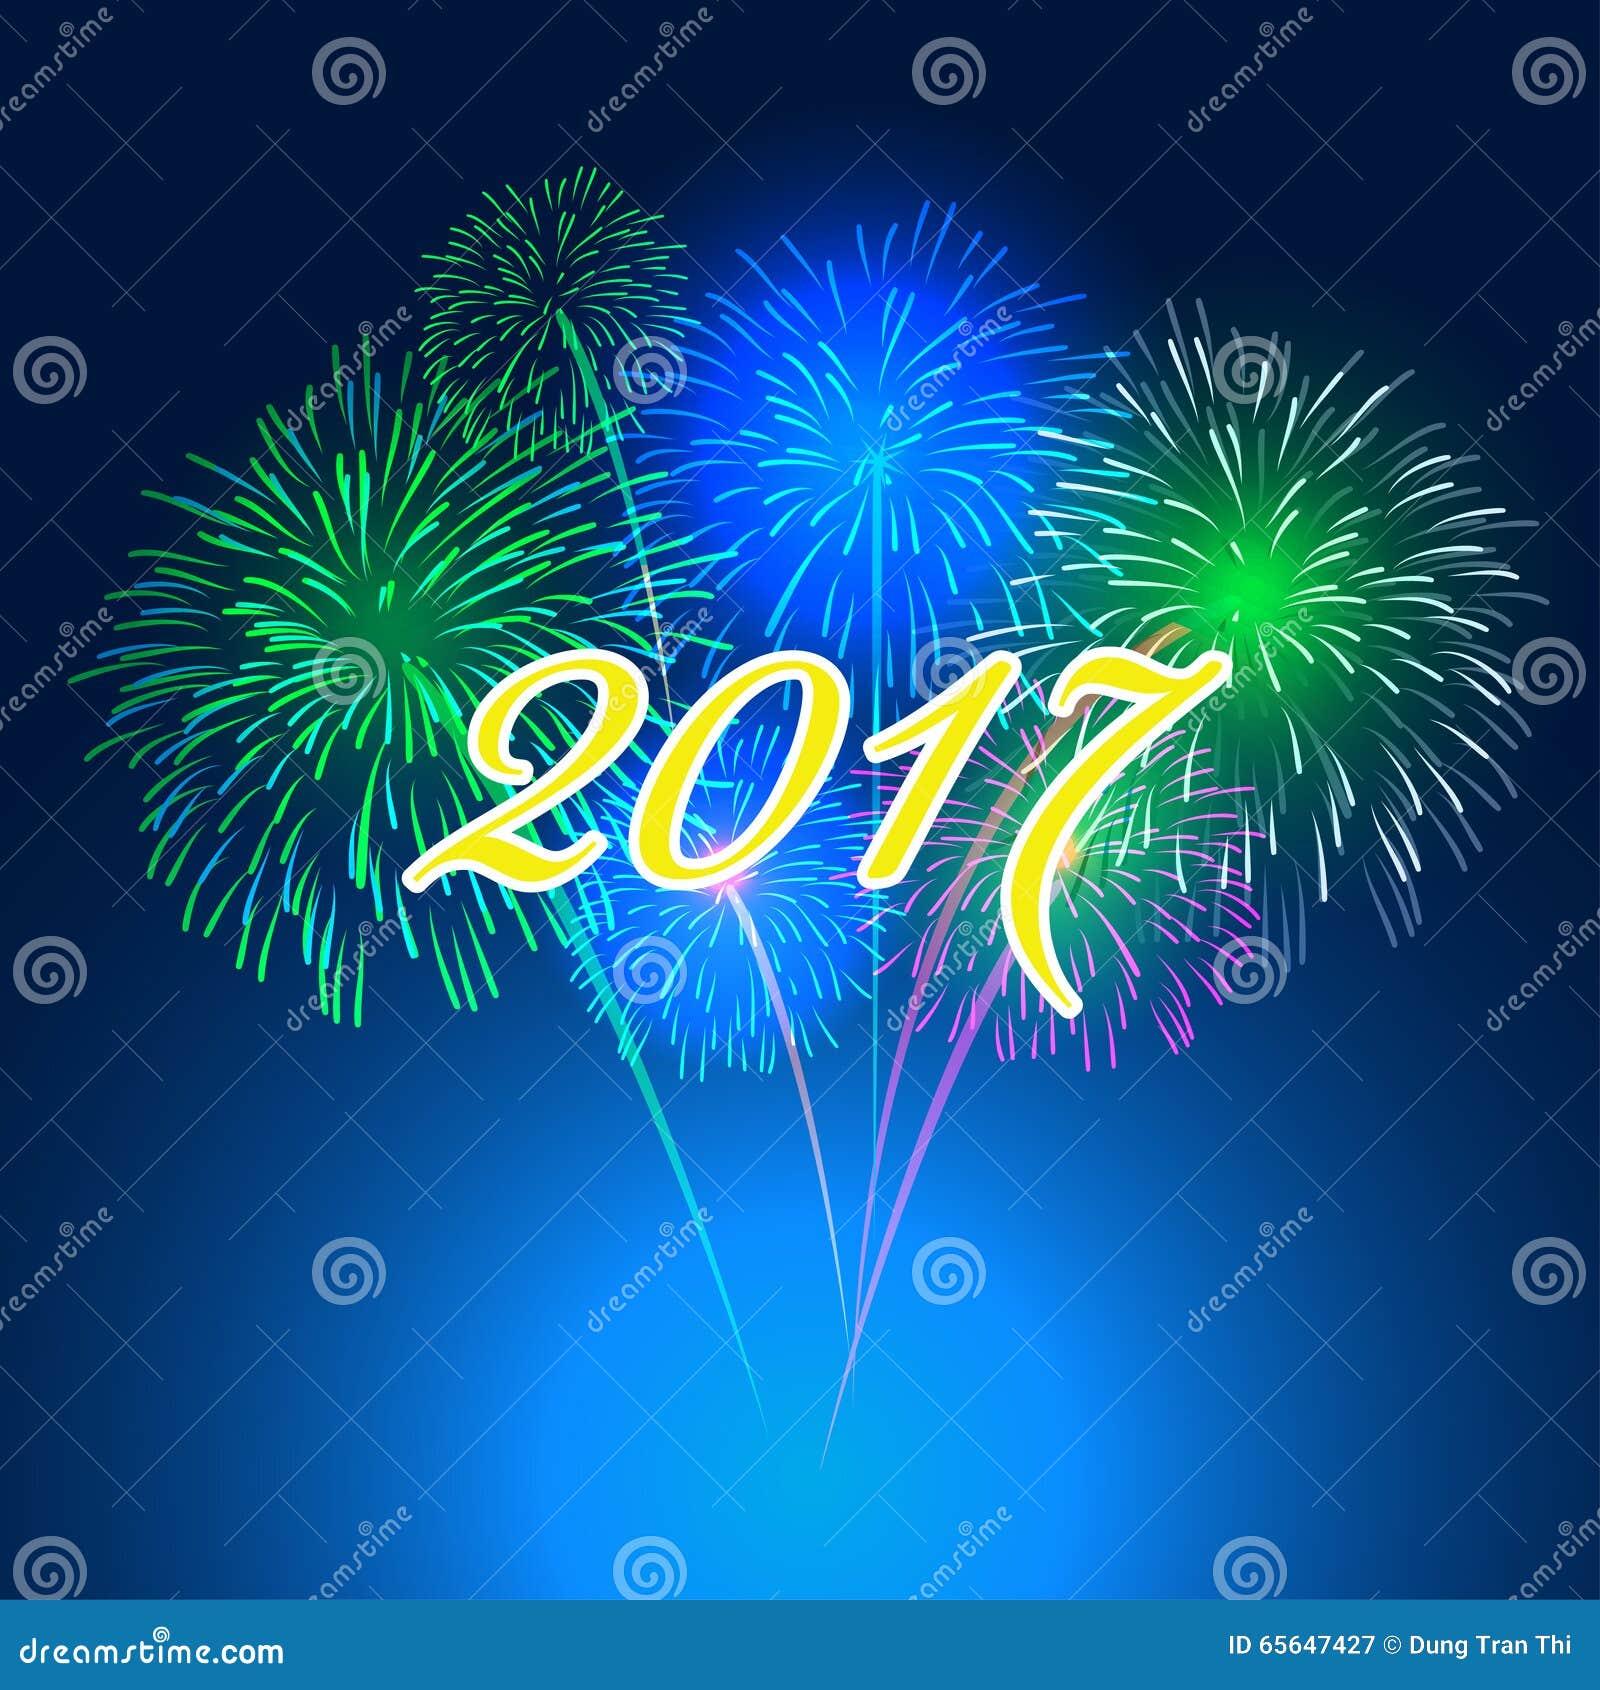 Background image 2017 - Happy New Year Fireworks 2017 Holiday Background Design Royalty Free Stock Photography